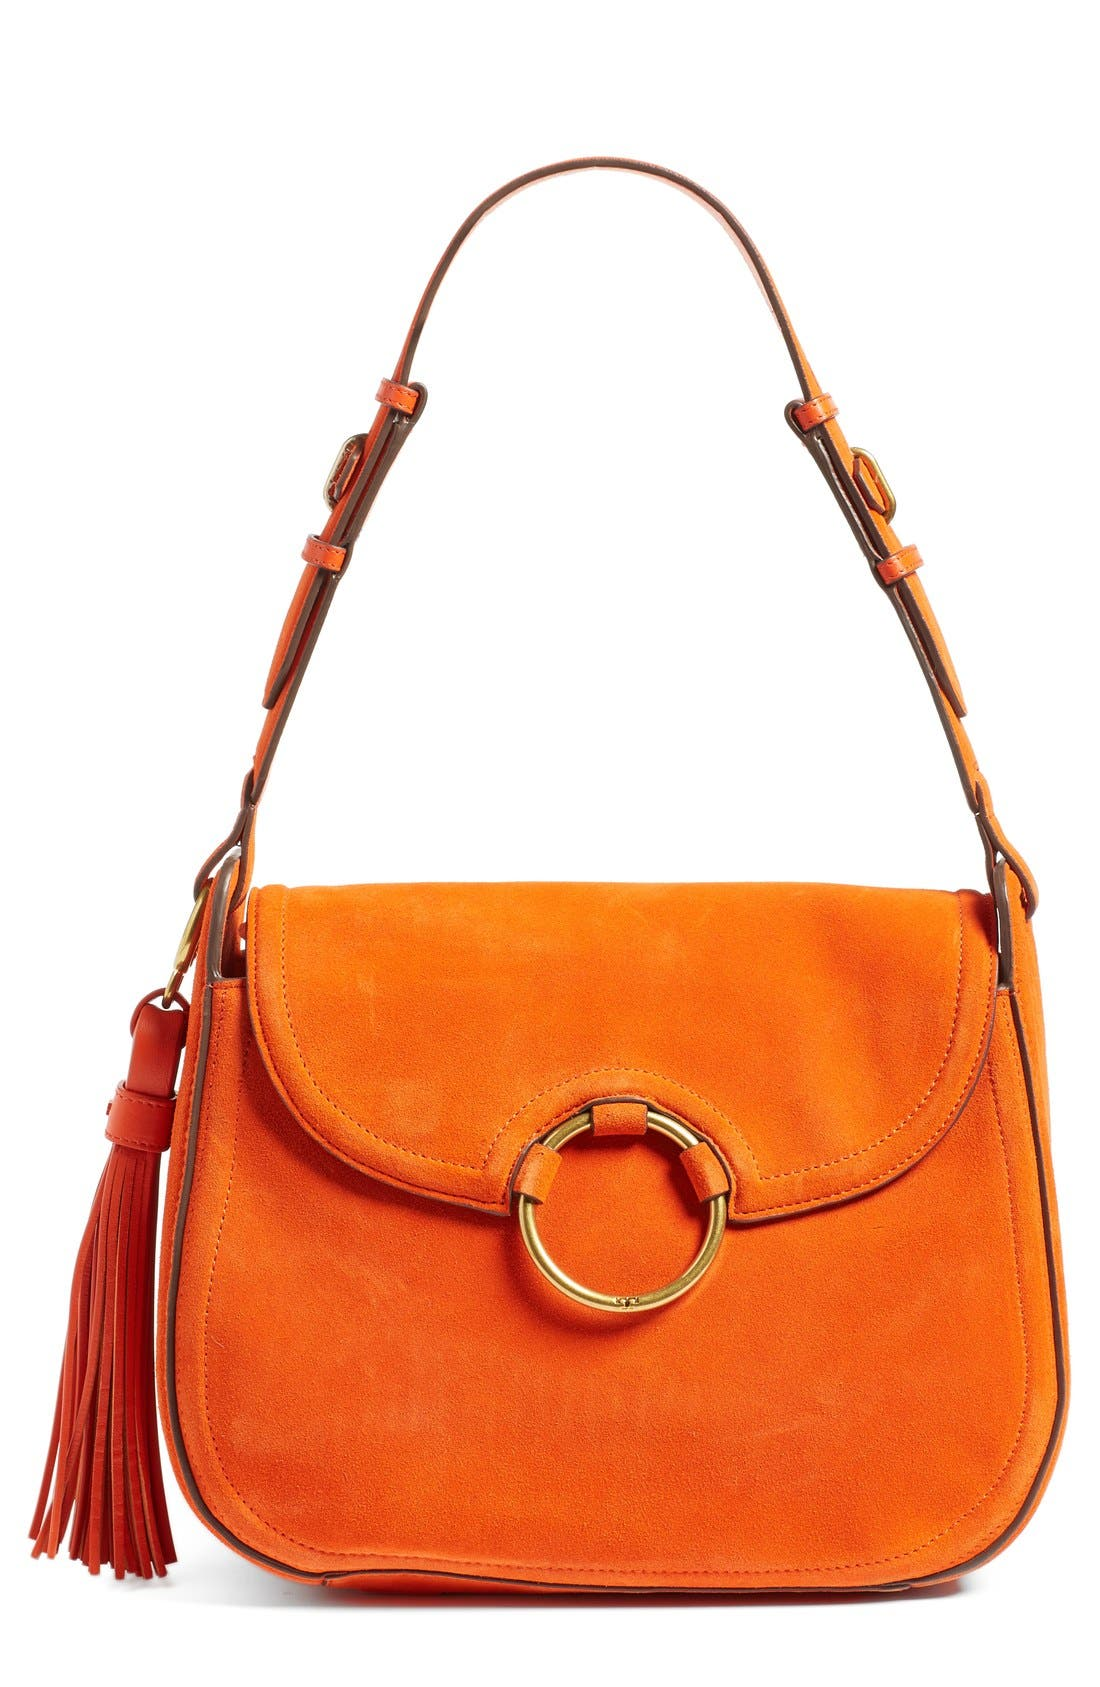 Alternate Image 1 Selected - Tory Burch Leather Shoulder Bag